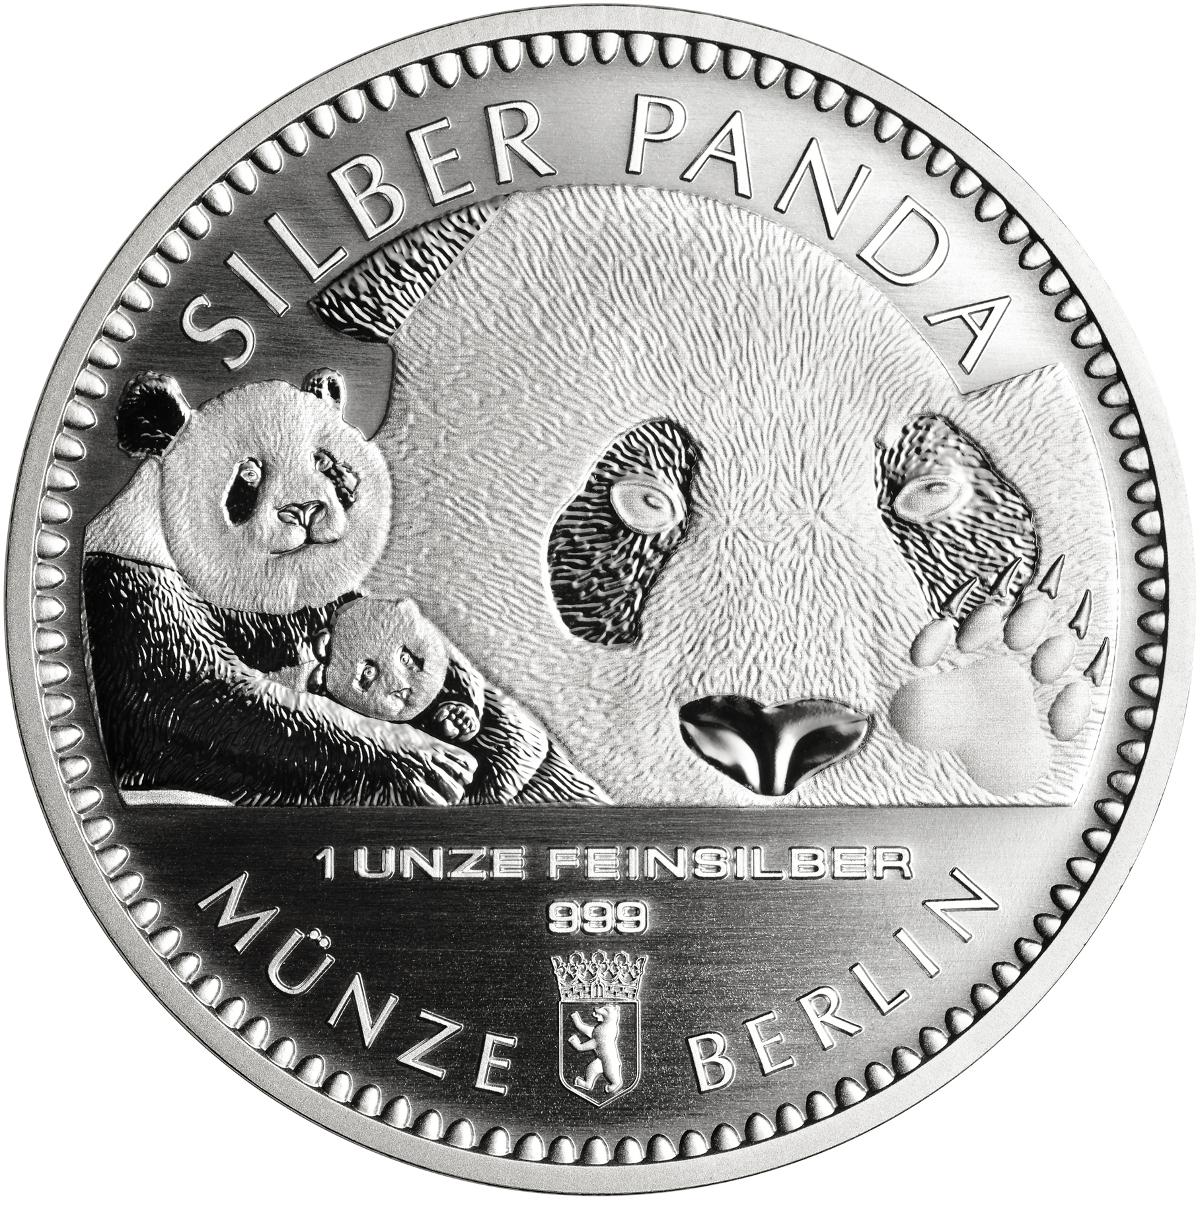 1 Unze Silber Panda 2018 Münze Berlin Round